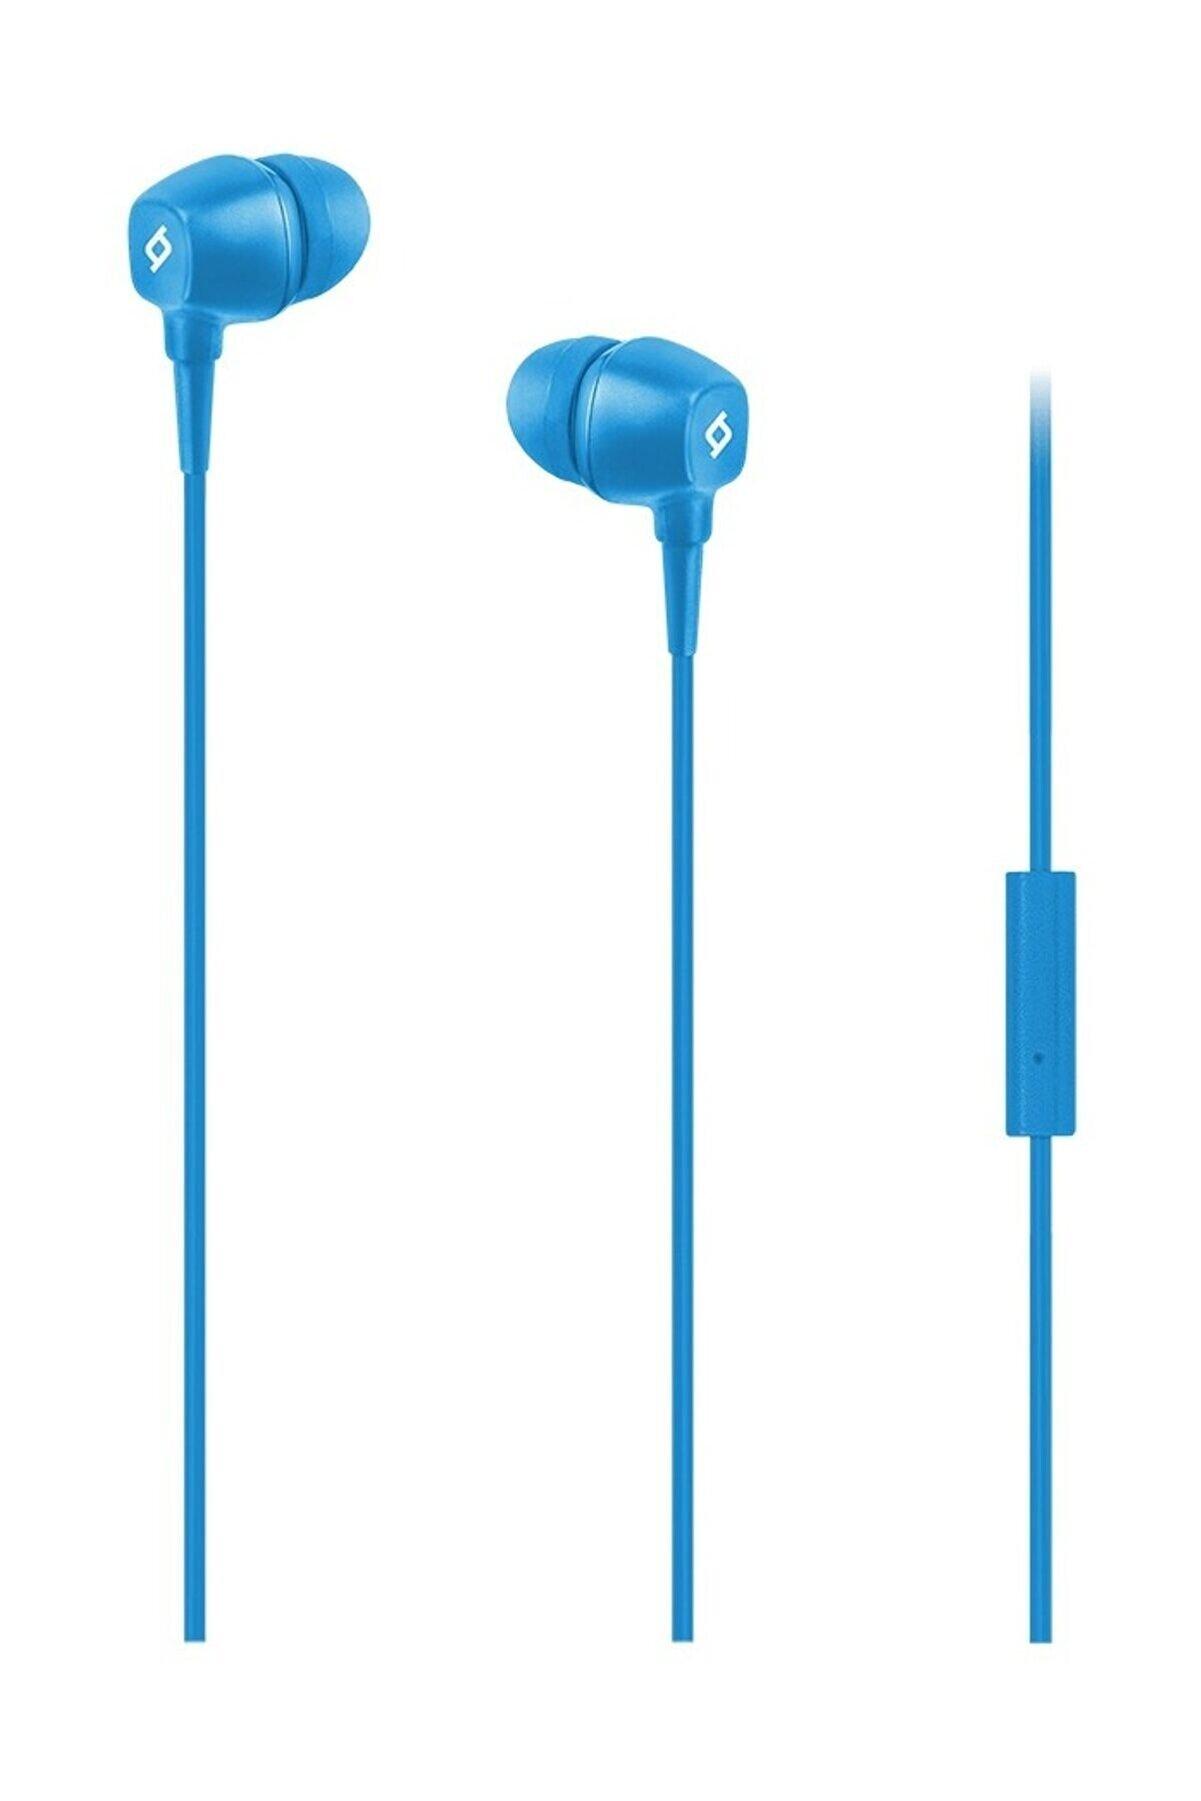 Ttec Pop Mikrofonlu Kulakiçi Kulaklık 3.5mm Mavi